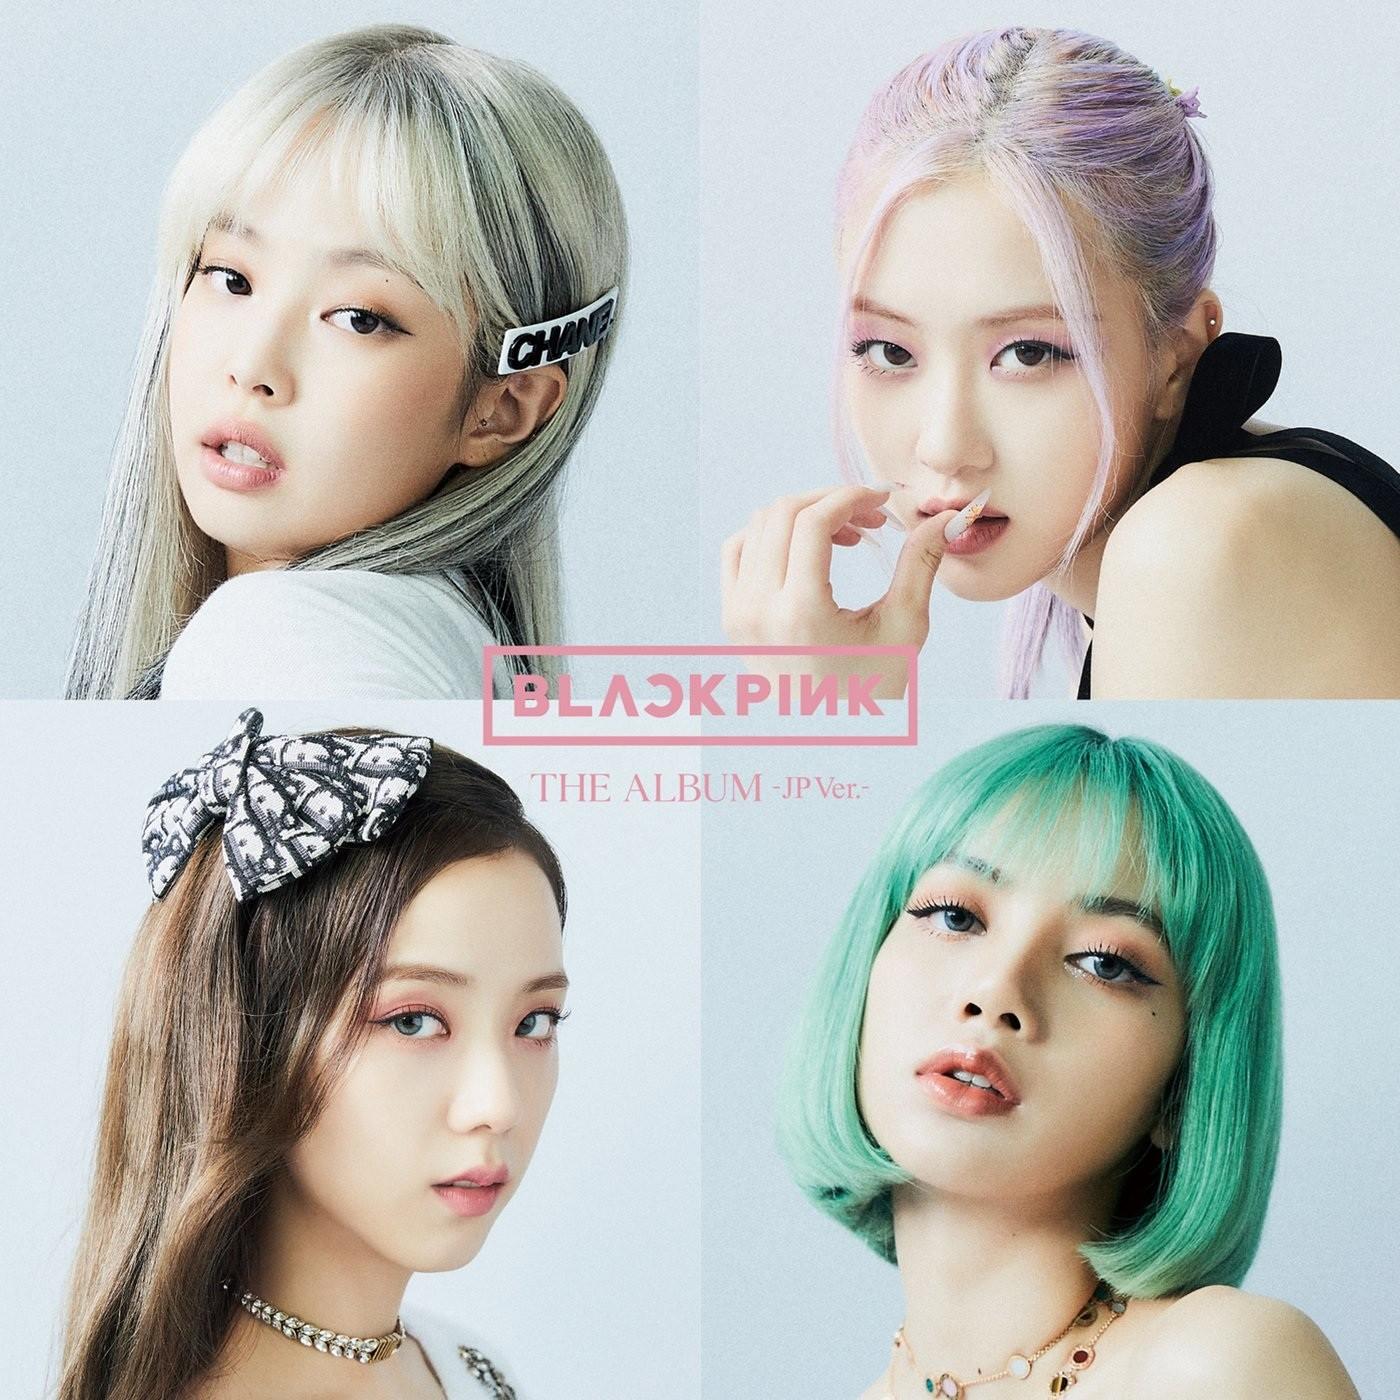 BLACKPINK – THE ALBUM (Japan Version) [24bit Lossless + MP3 320 / WEB] [2021.08.03]